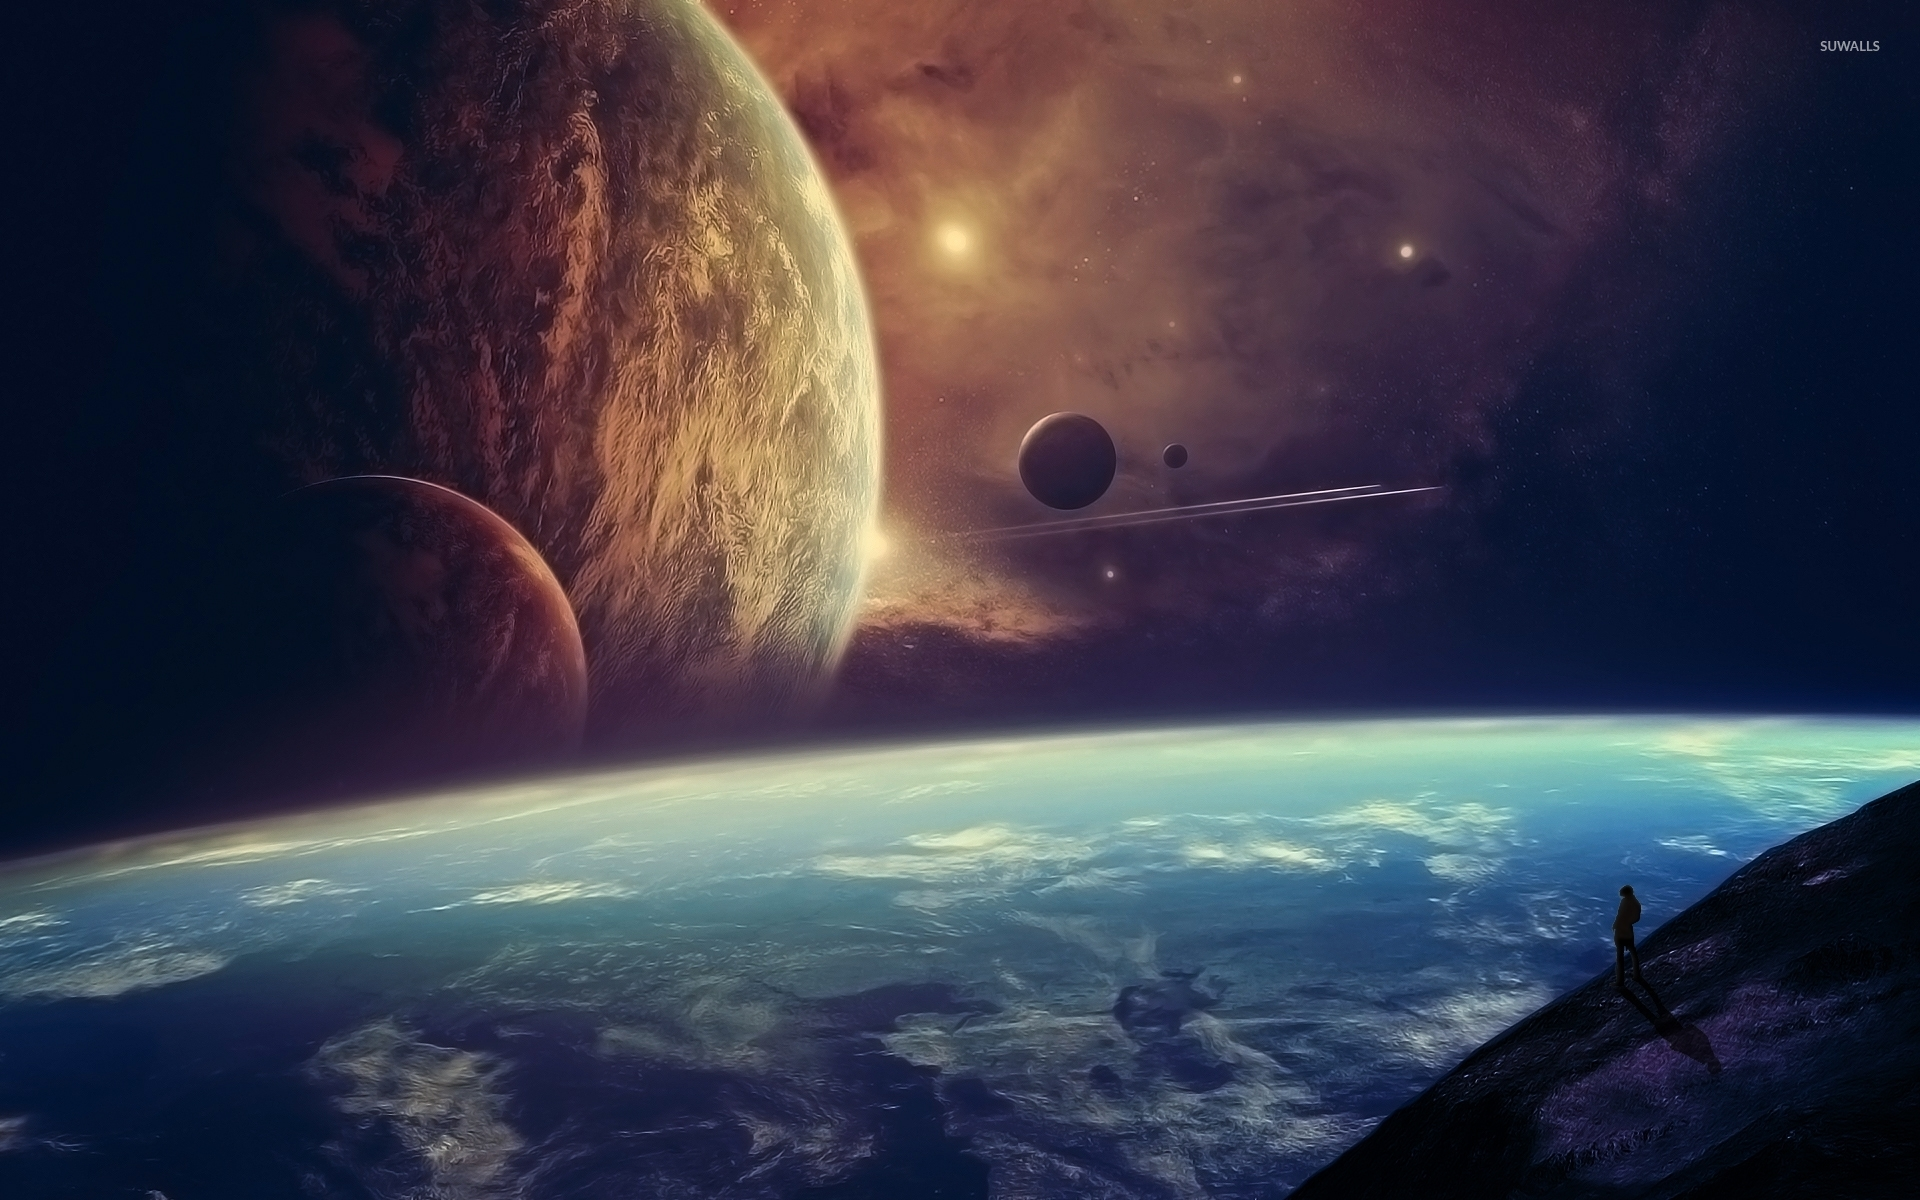 Eye Of God Helix Nebula Wallpaper Space Wallpapers 48629